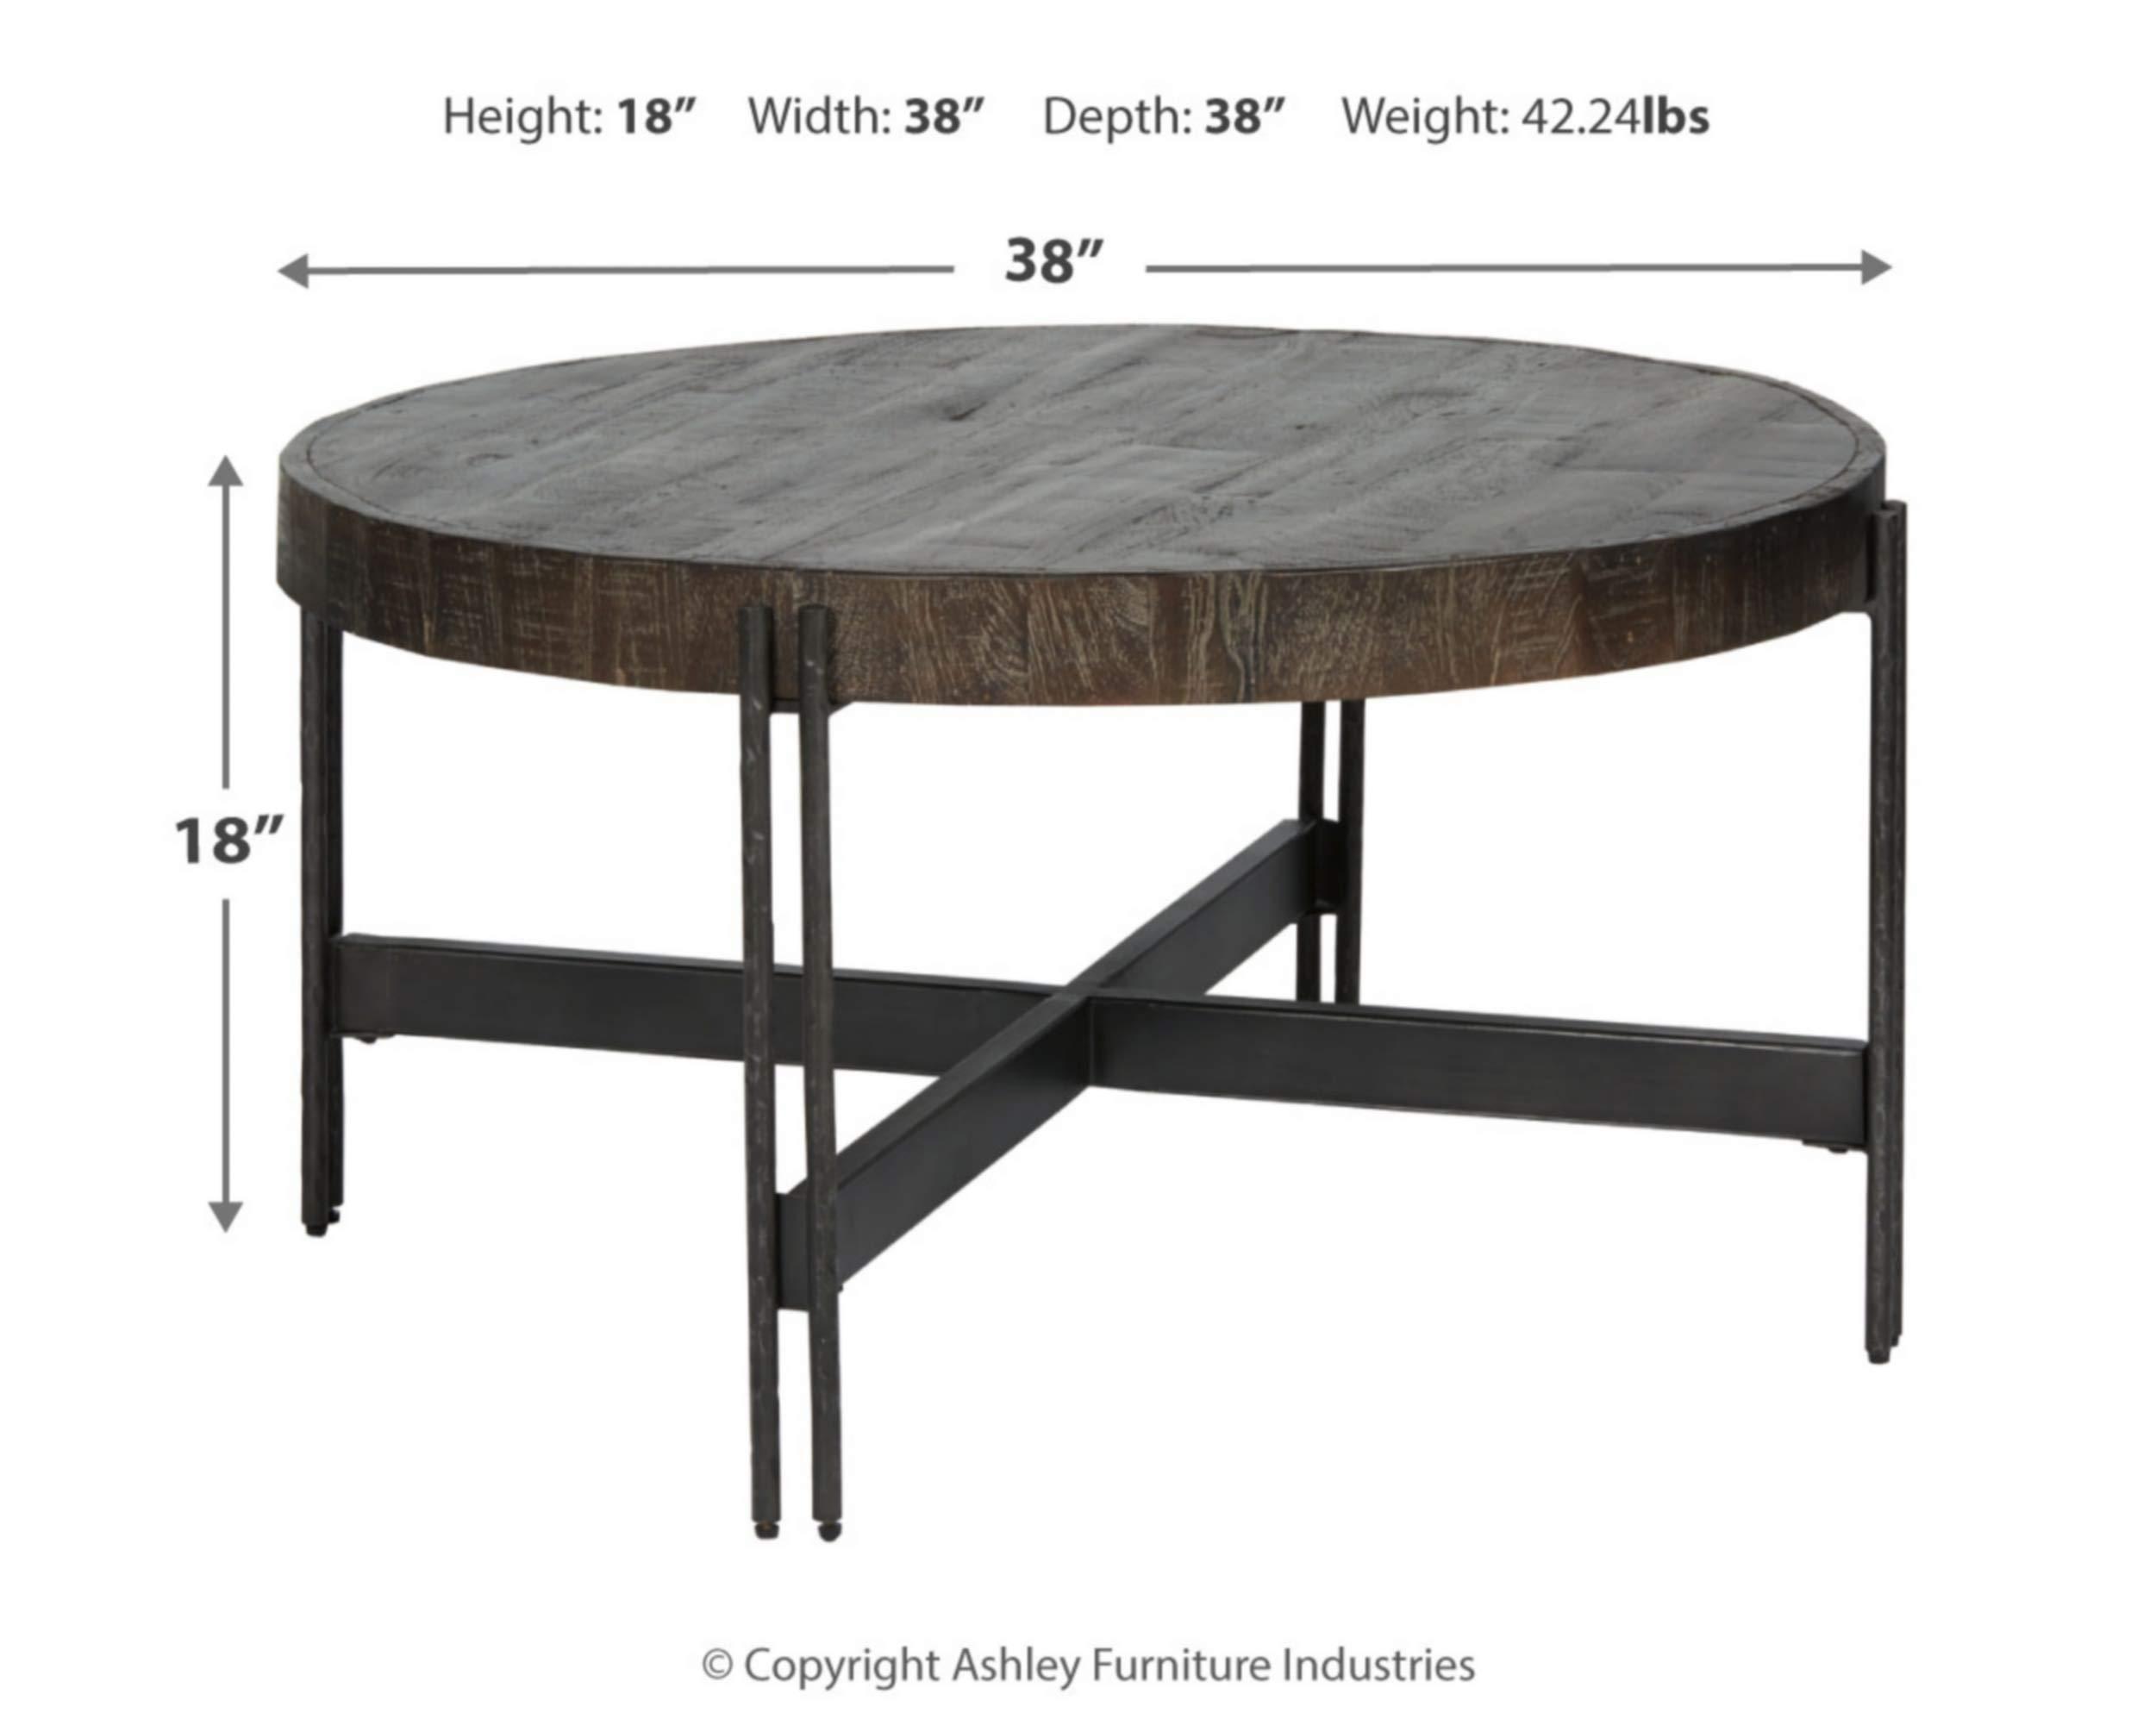 Signature Design By Ashley Jillenhurst Round Rustic Cocktail Table Dark Brown Furniture Decor